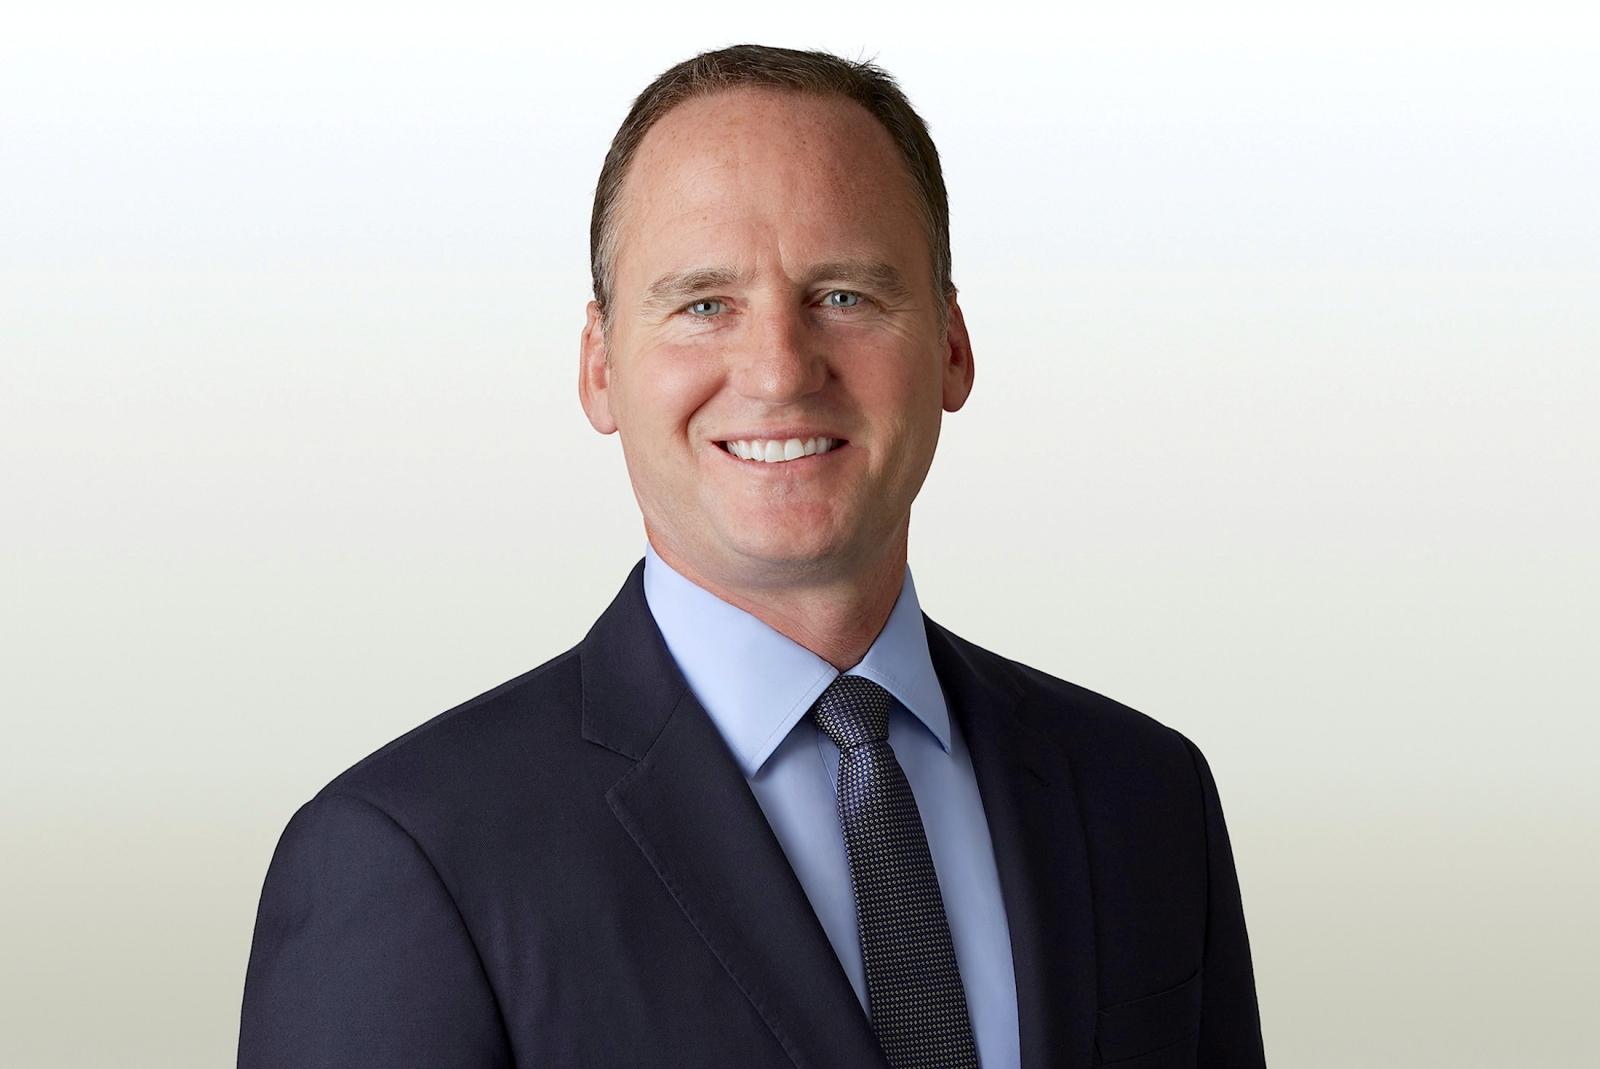 BHP Billiton Names Ken MacKenzie as New Chairman